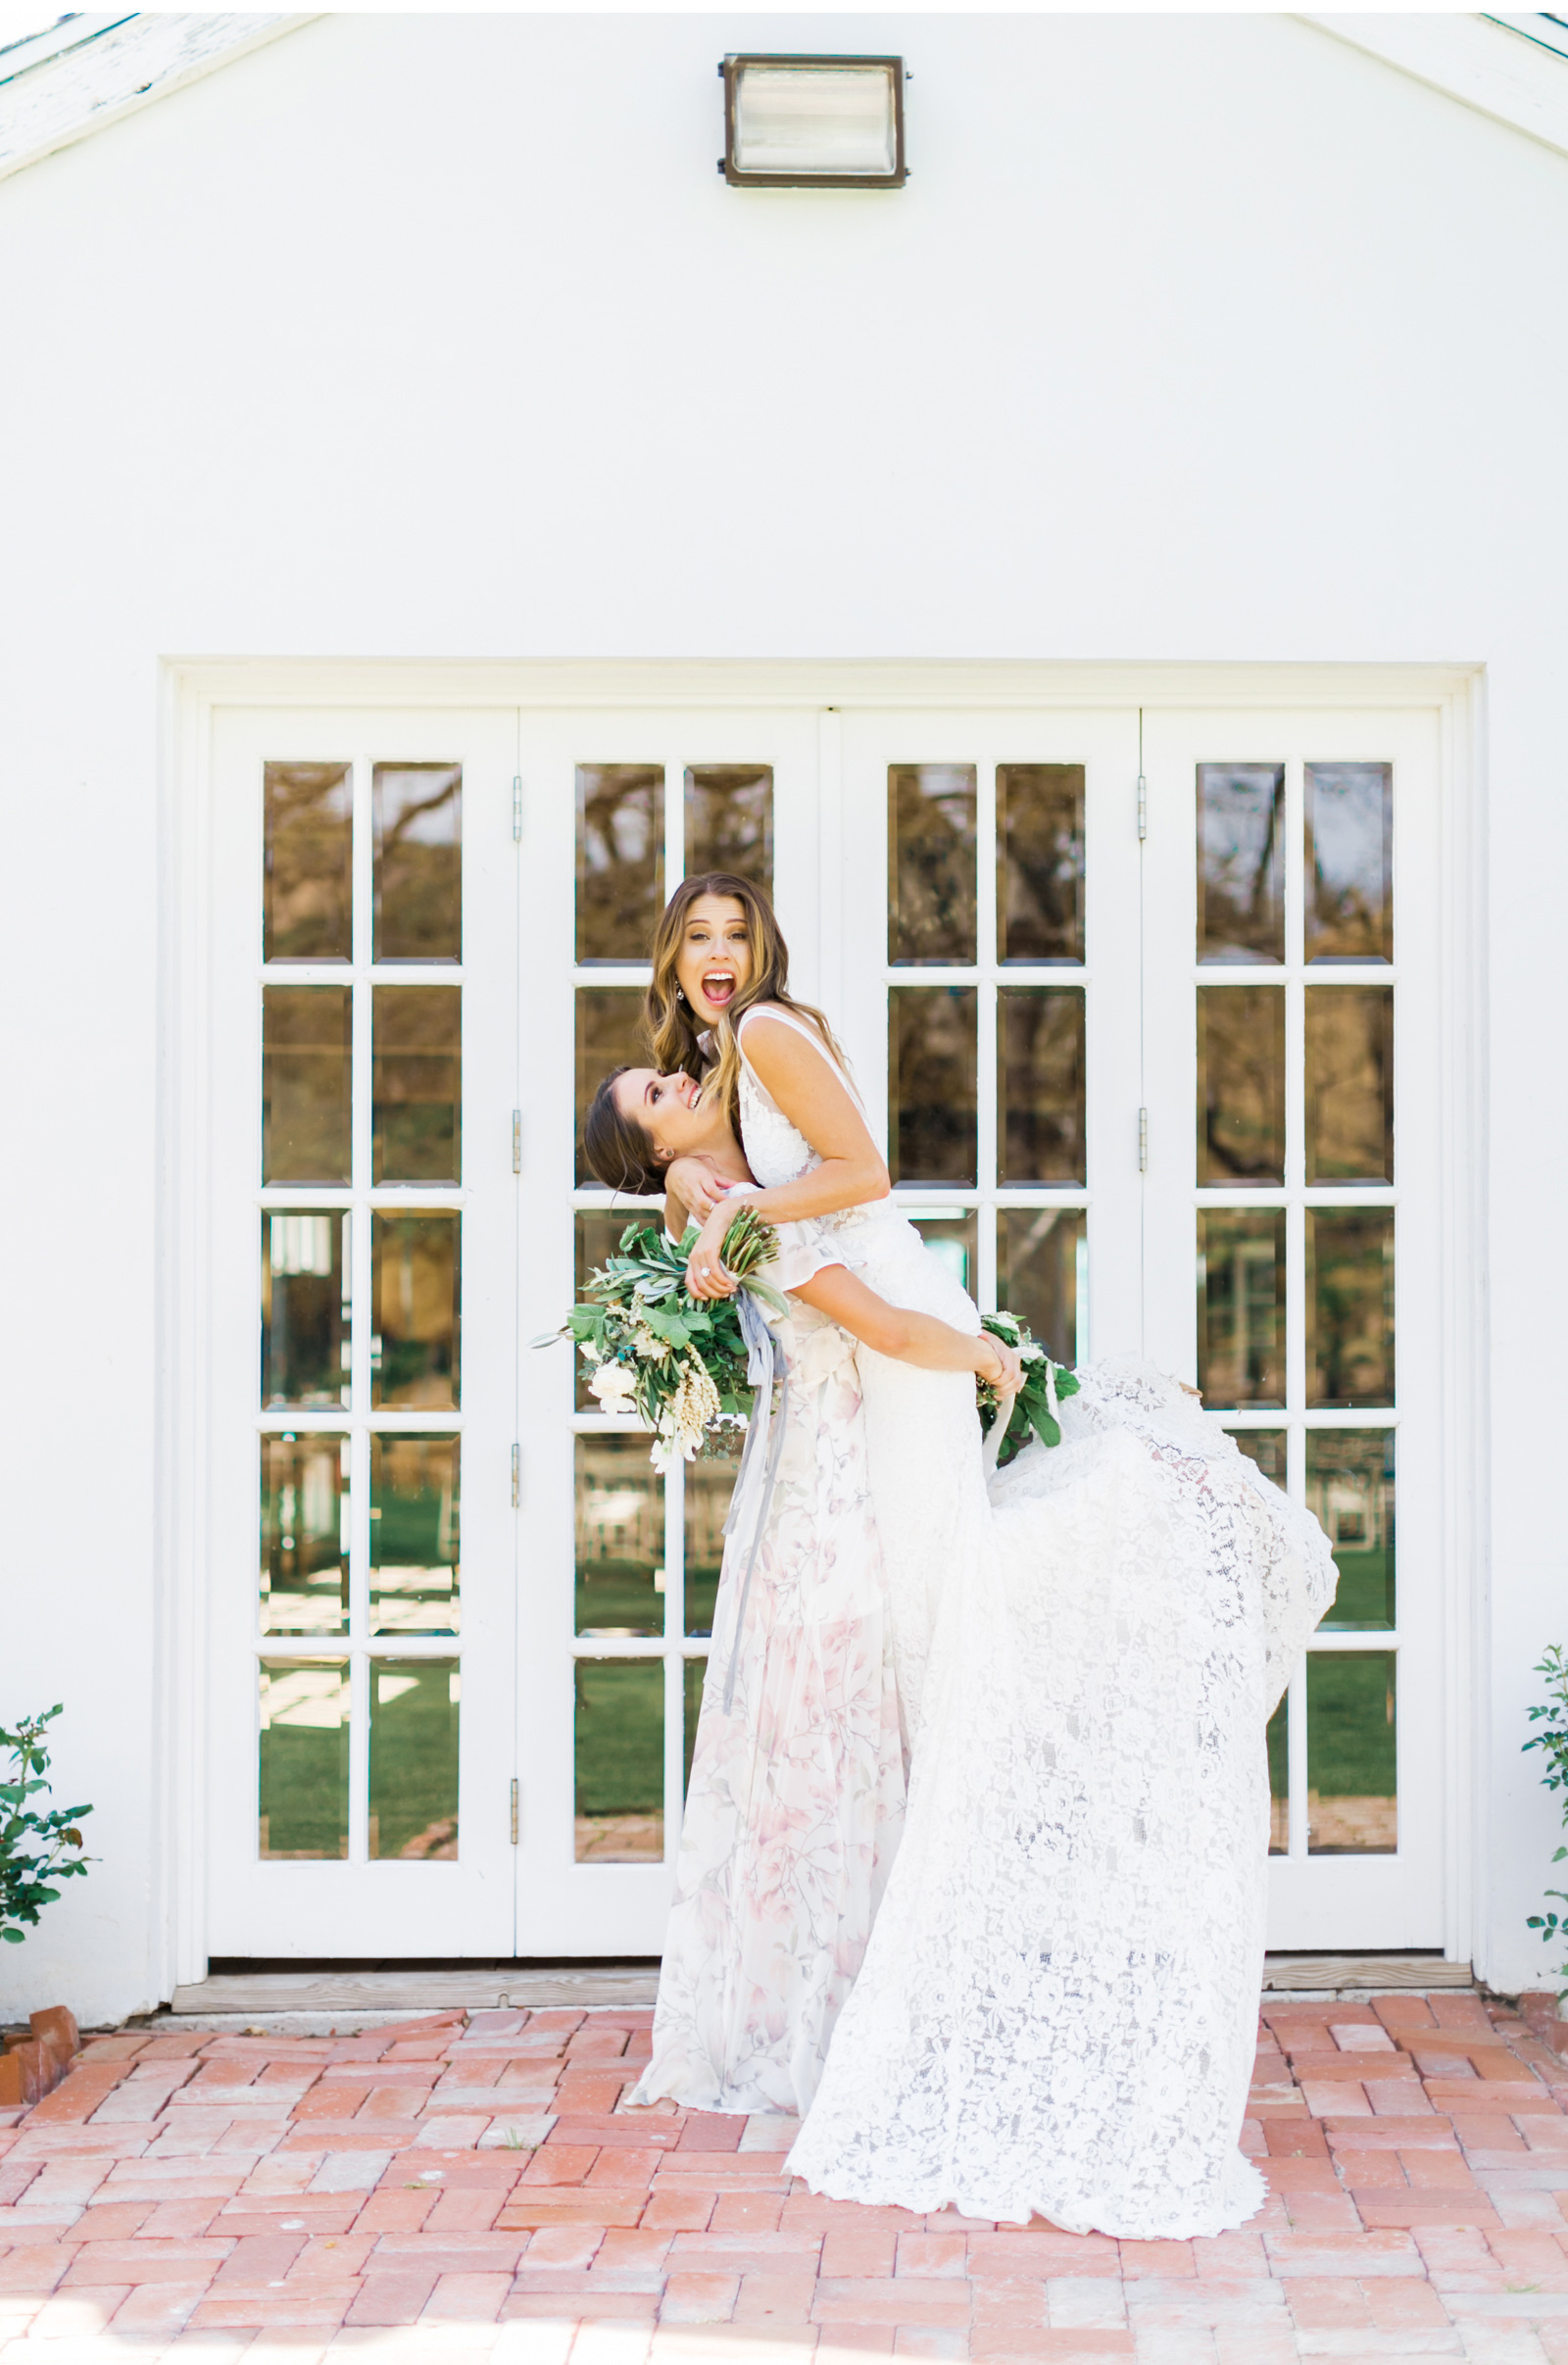 Malibu-Wedding-Photographer-Saddlerock-Ranch-Triunfo-Creek-Style-Me-Pretty_06.jpg